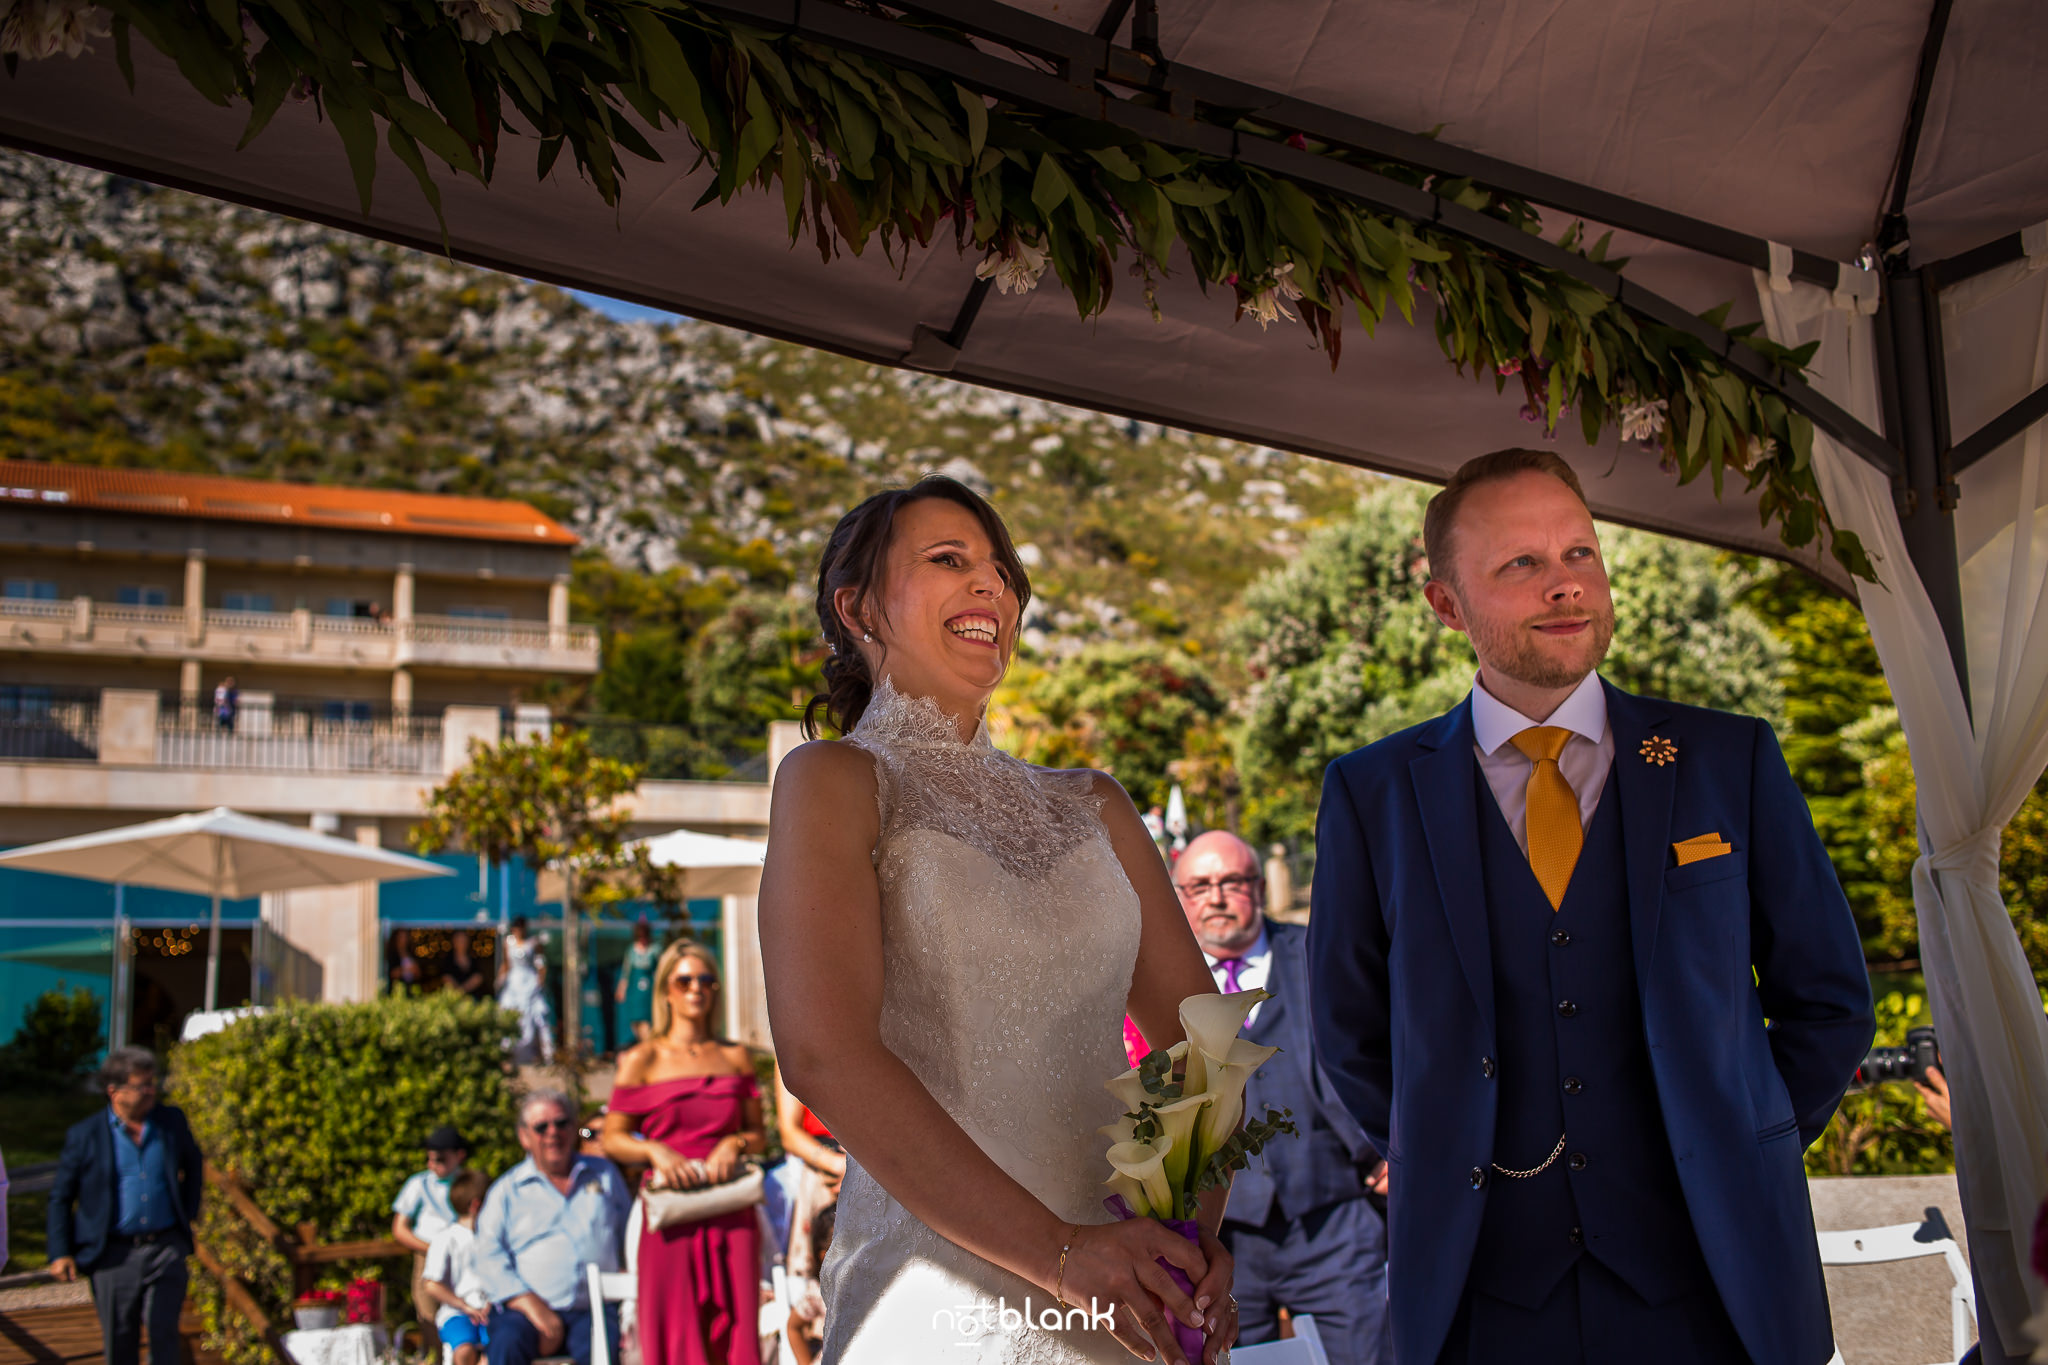 Boda-Maite-David-Novia-Riéndose-En-Altar-Junto-A-Novio. Reportaje realizado por Notblank fotógrafos de boda